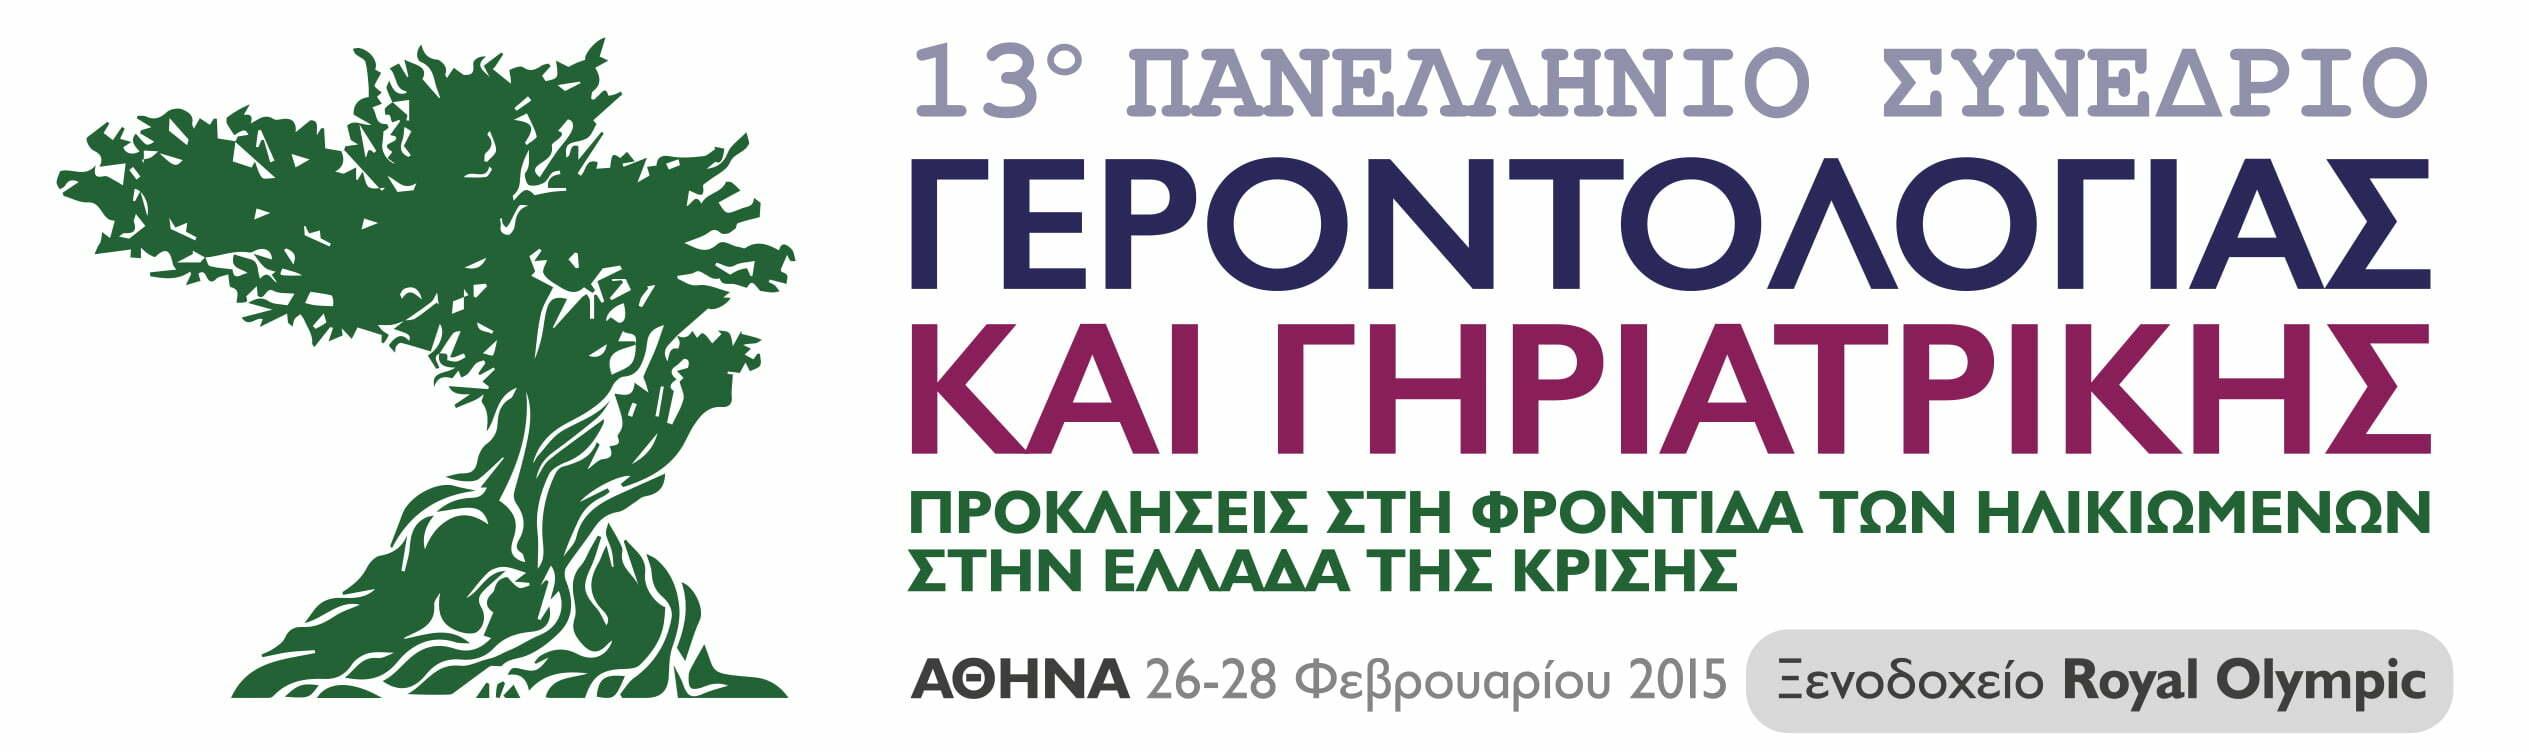 140917 Logo Συνεδρίου